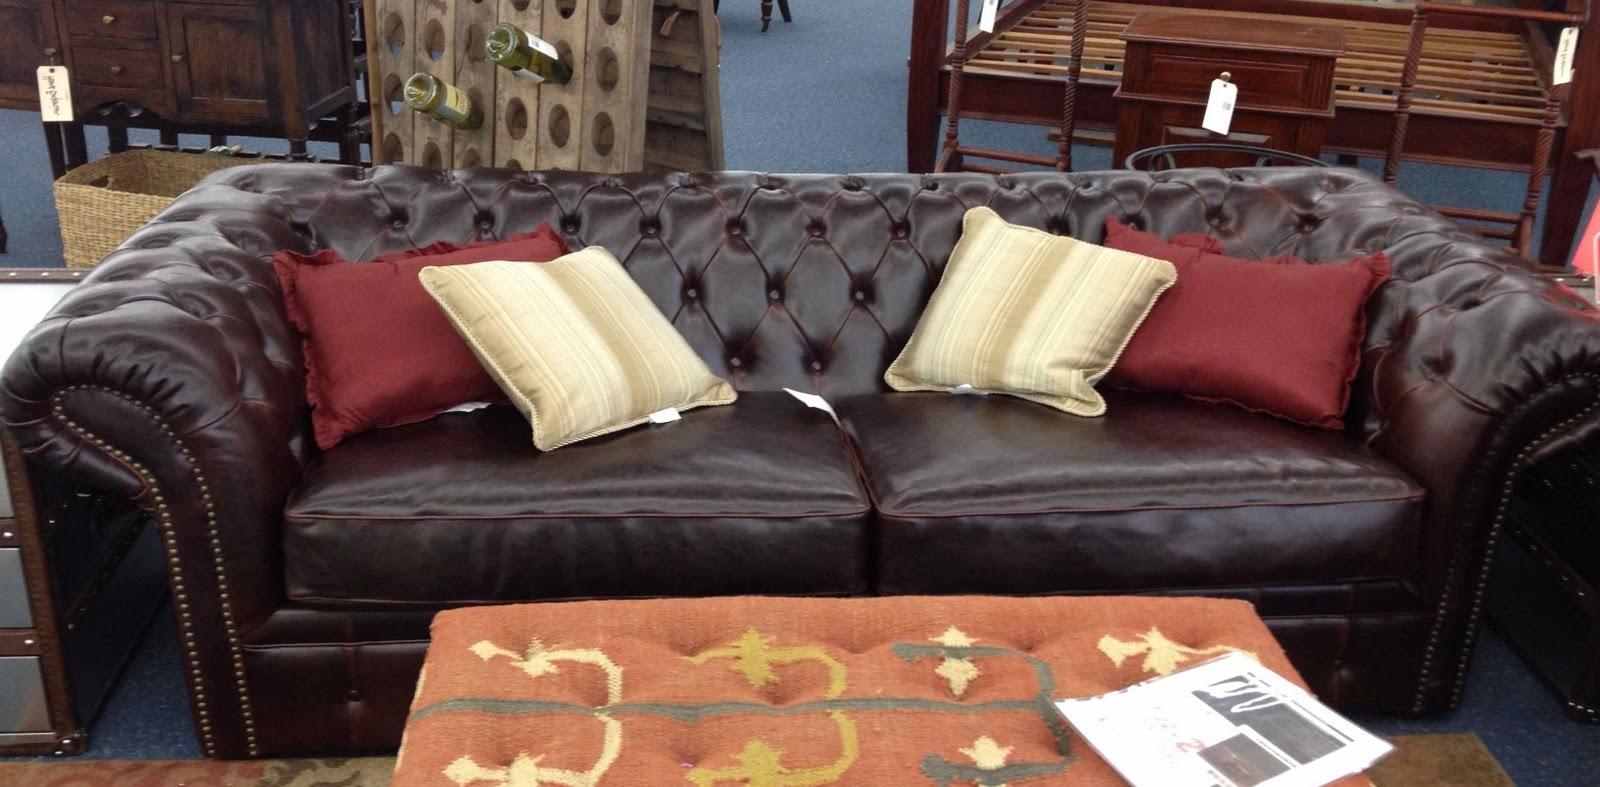 Amazing Craigslist Leather Sofa 52 In Sofa Room Ideas With In Famous Craigslist Leather Sofas (View 4 of 15)